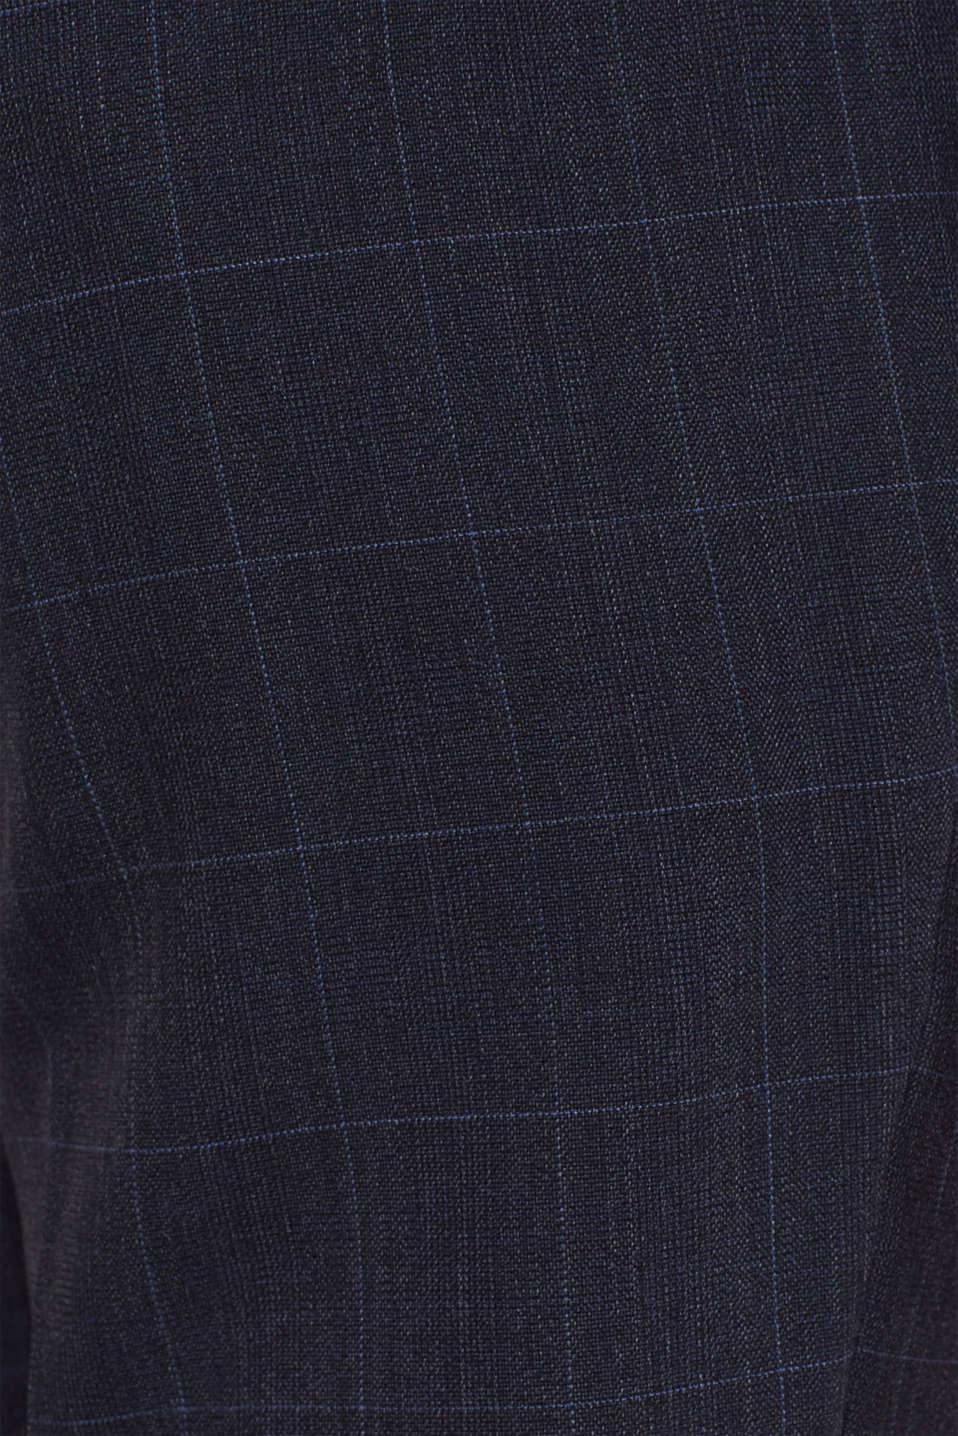 Pants suit, DARK BLUE, detail image number 3